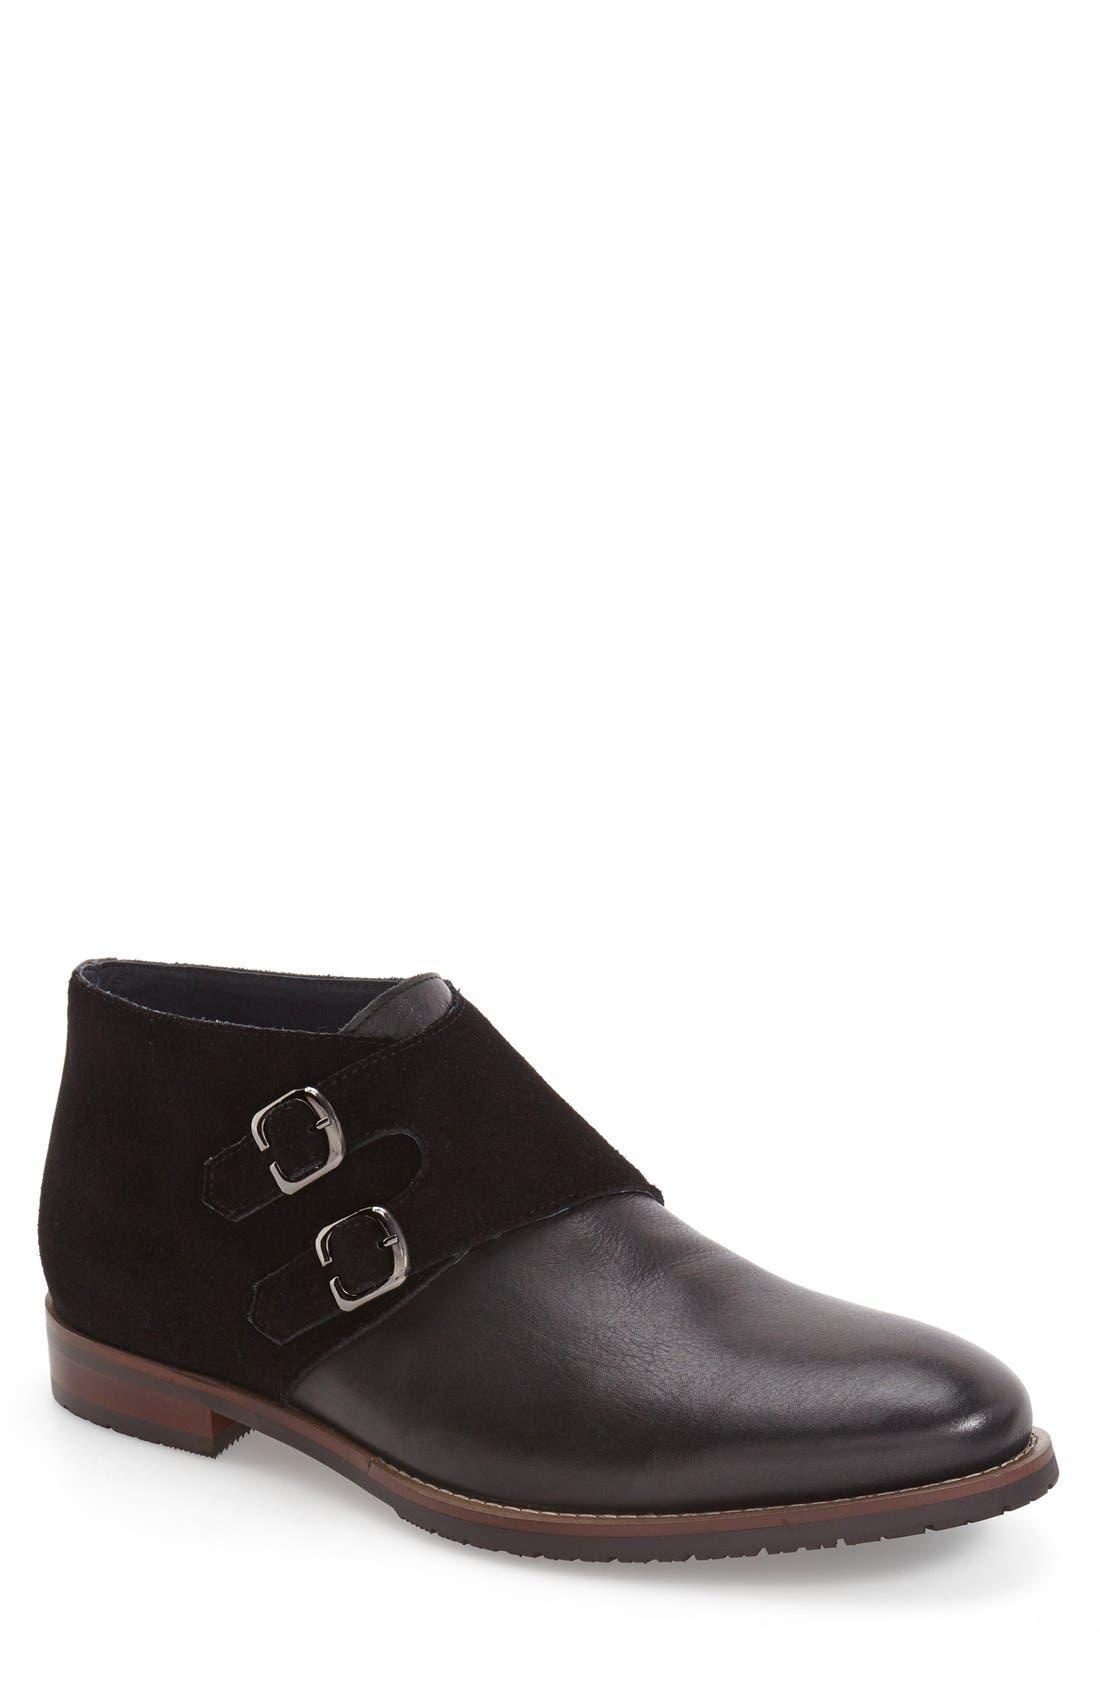 Zanzara 'Napoli' Double Monk Strap Shoe (Men)